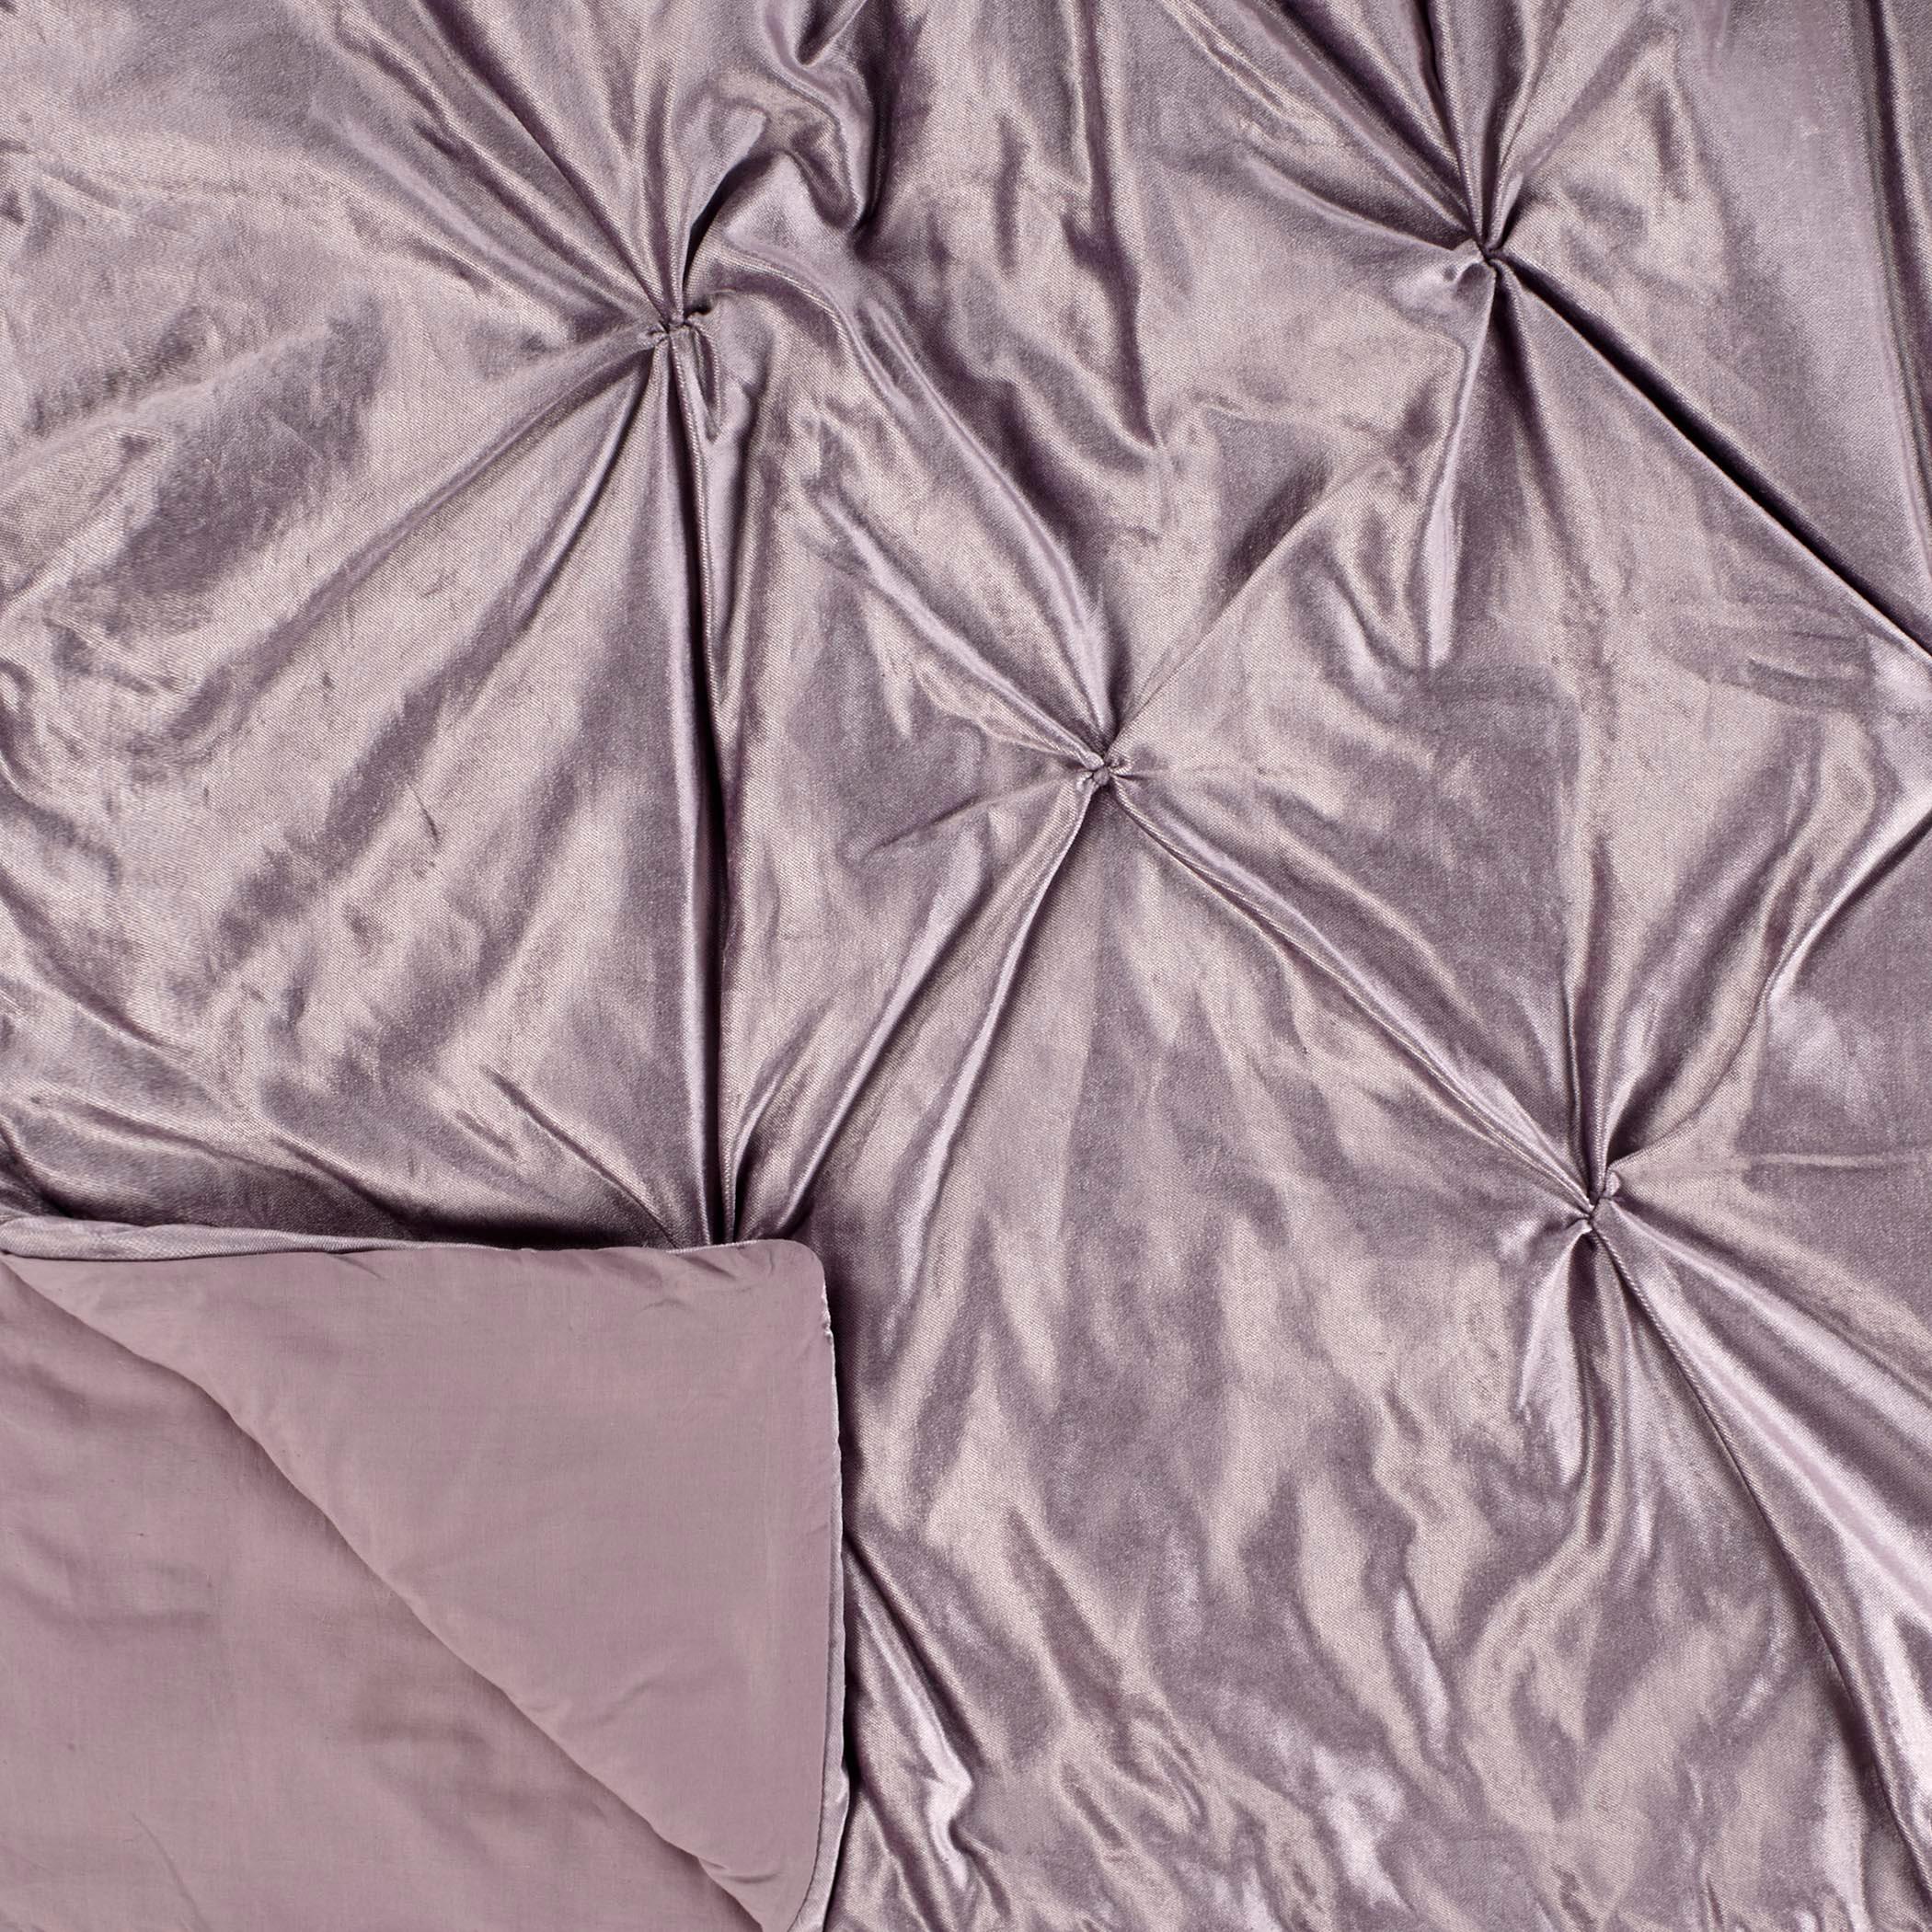 dual king duvet cover